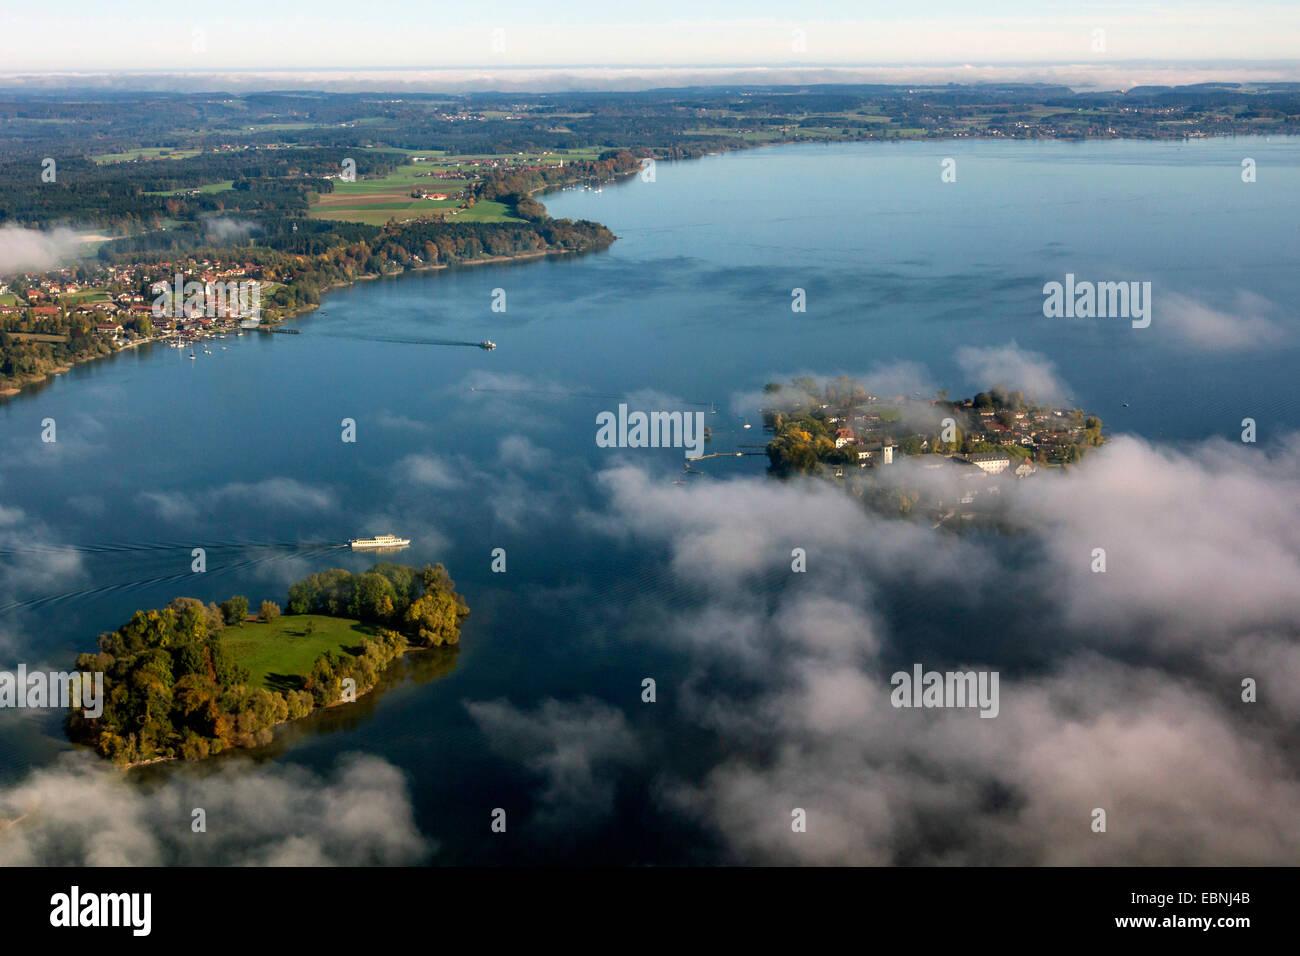 aerial view to Fraueninsel and Krautinsel, Germany, Bavaria, Lake Chiemsee Stock Photo